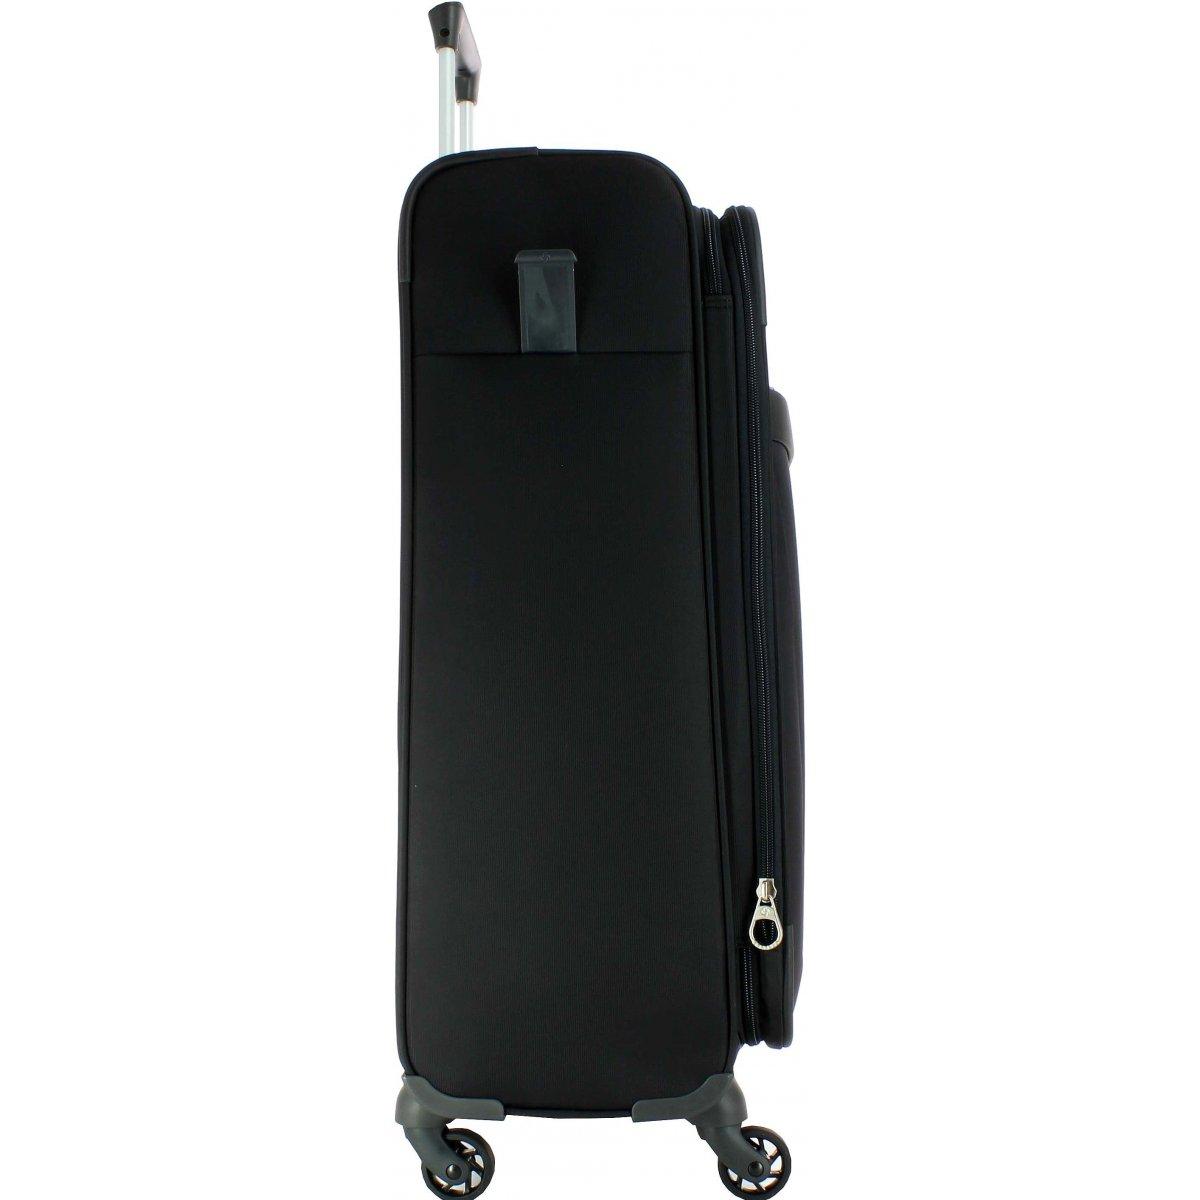 valise samsonite 4 roues good valise samsonite. Black Bedroom Furniture Sets. Home Design Ideas